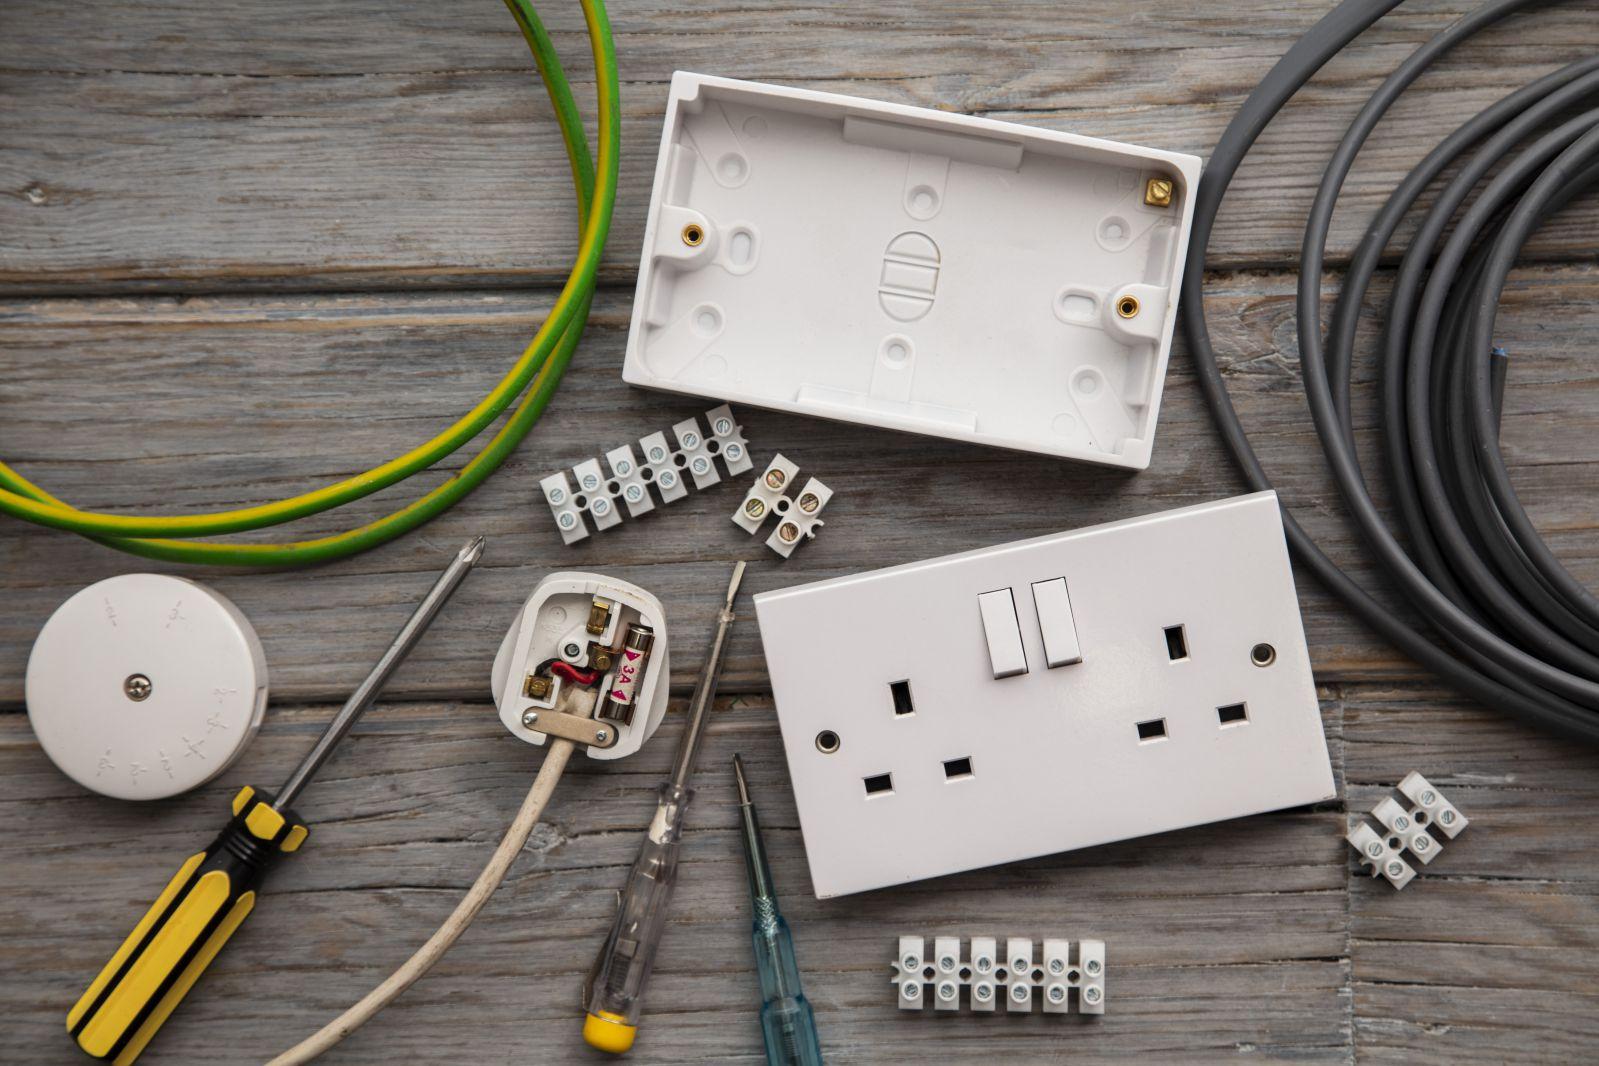 Electrician equipment for installing plug socket